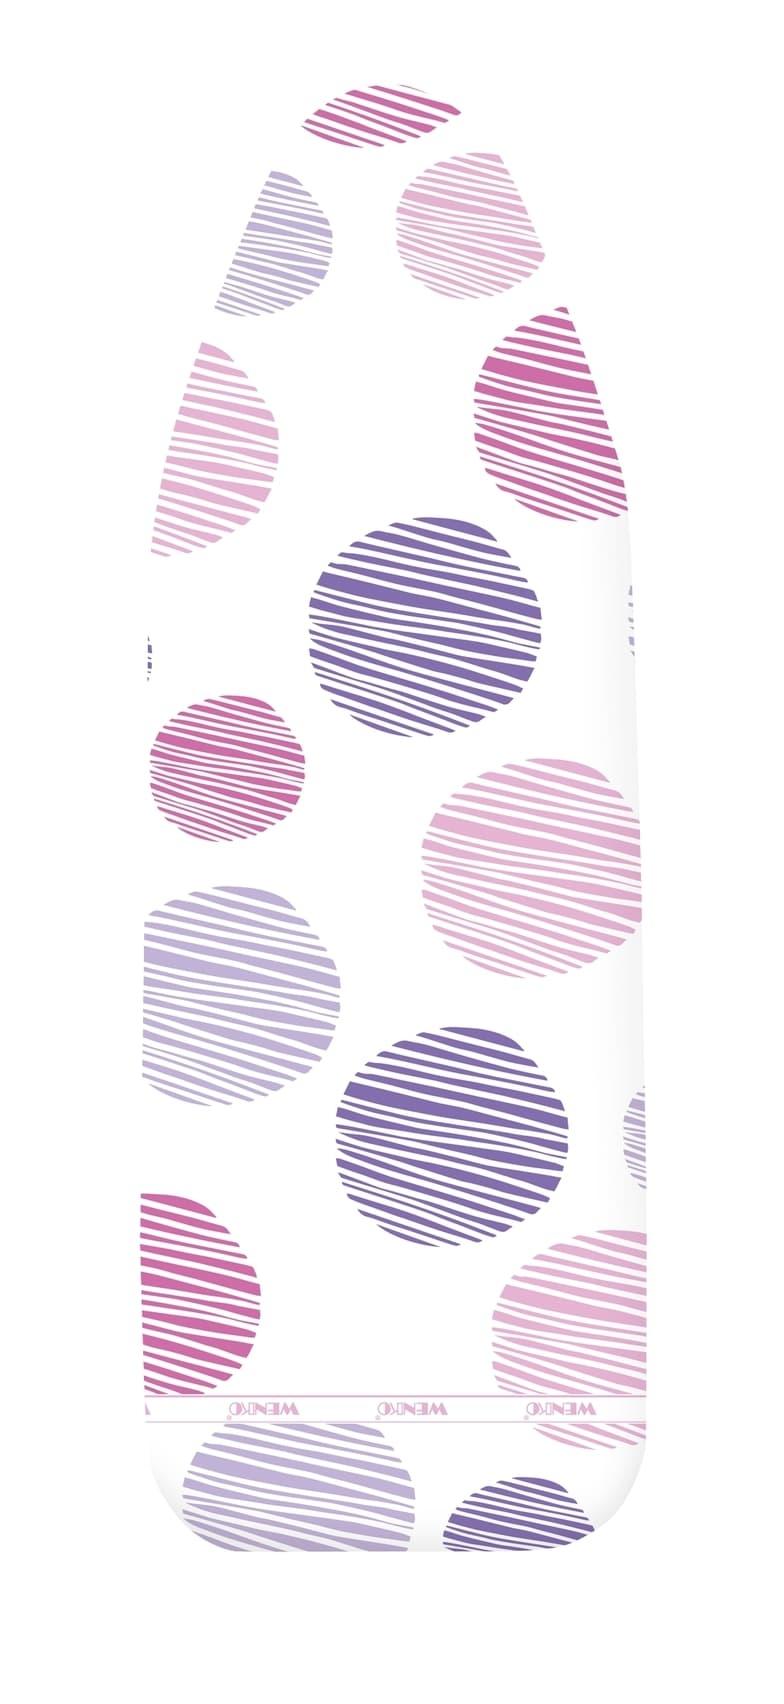 Husa masa de calcat din bumbac, Basic Pro S, Multicolor, L112xl33 cm